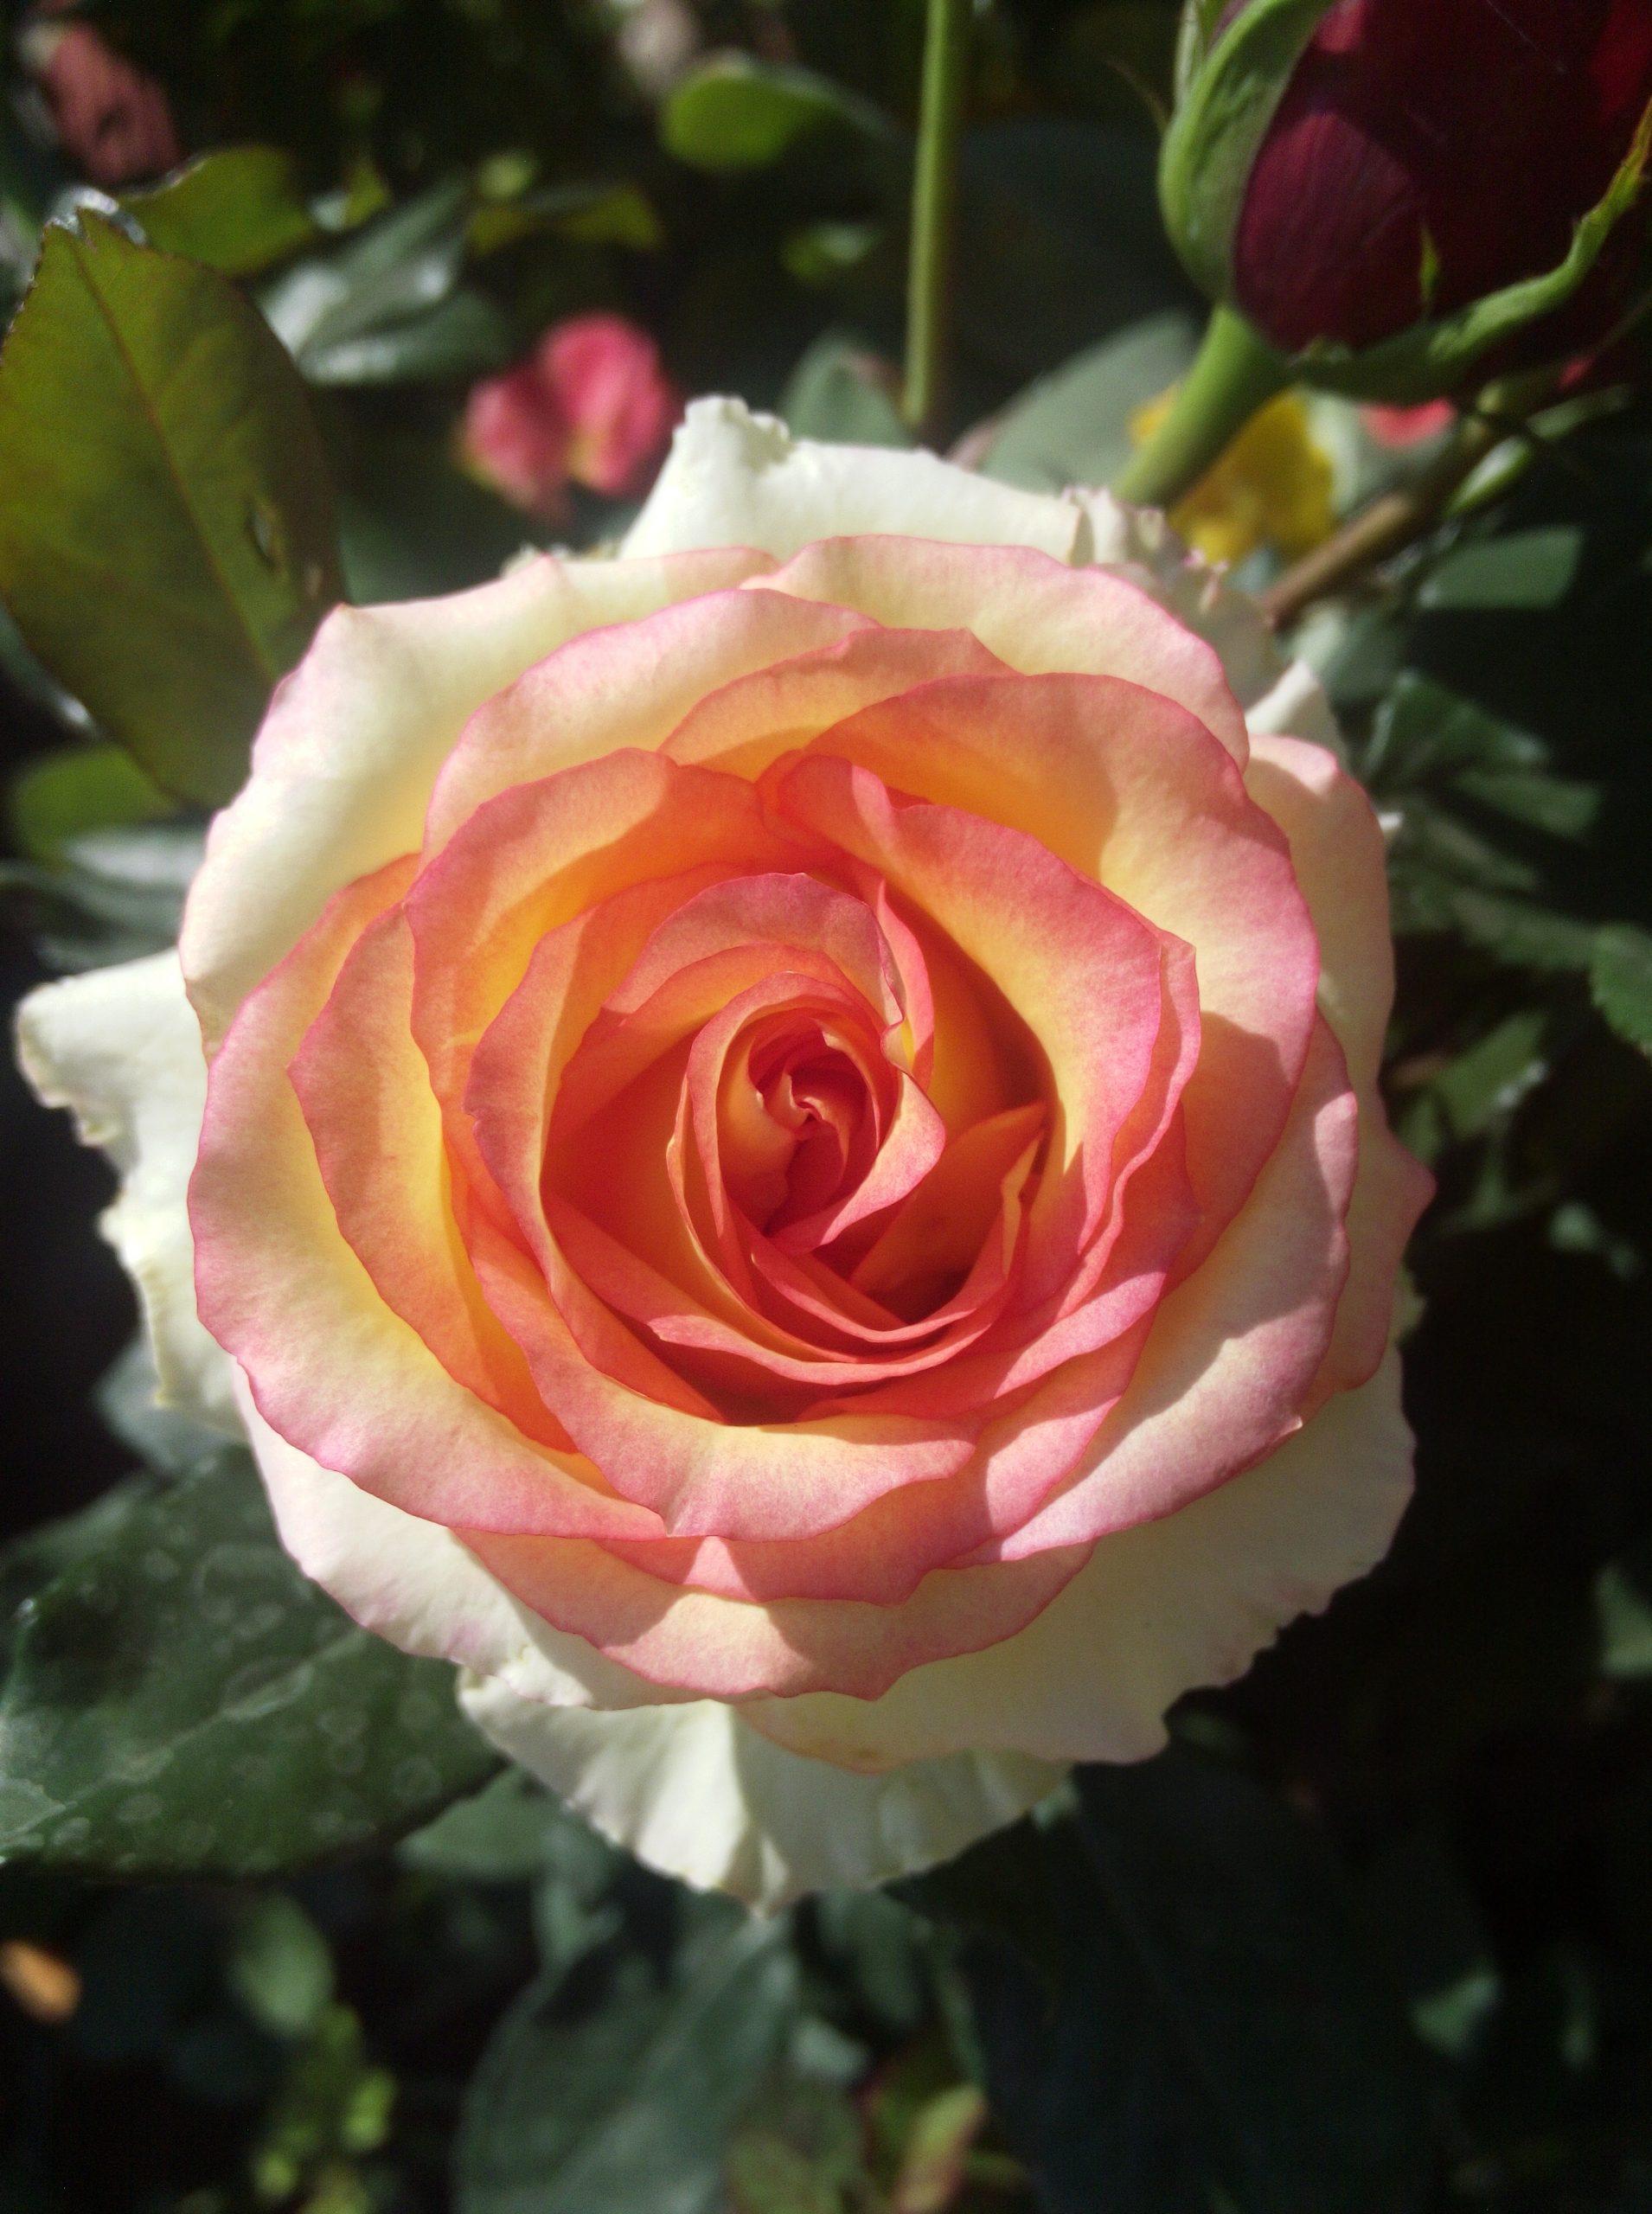 Blooming rose